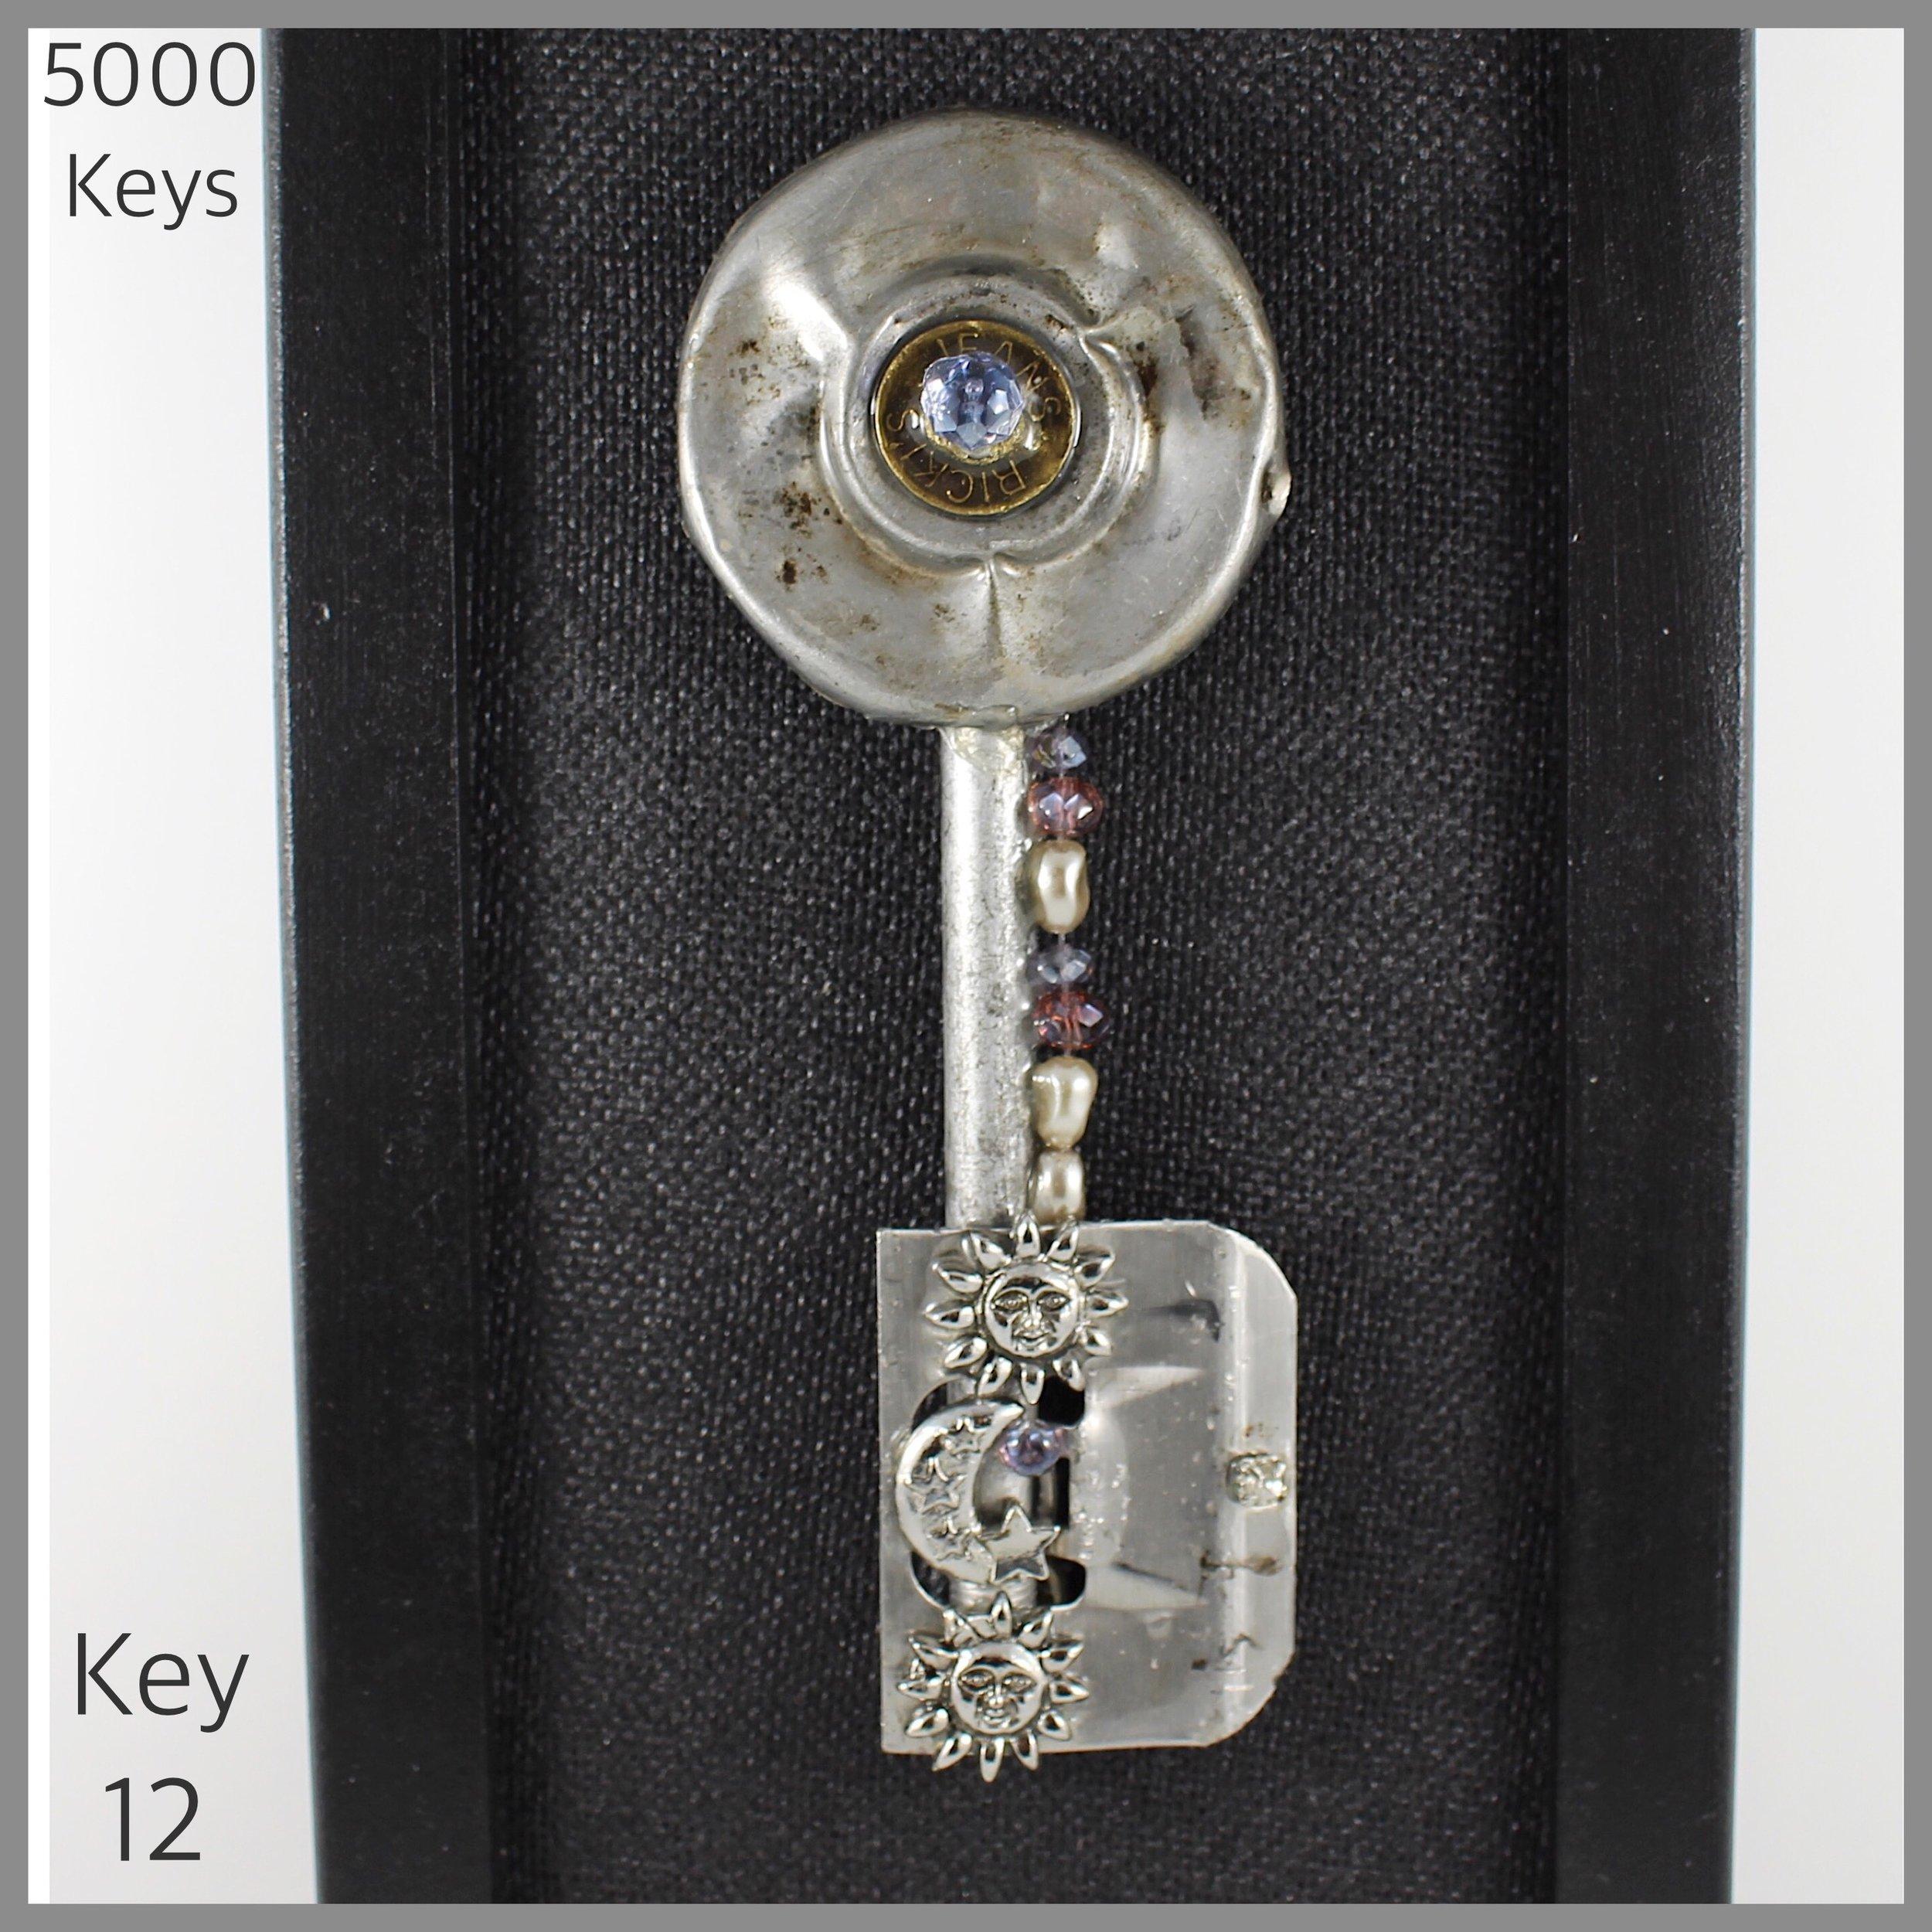 Key 12.JPG